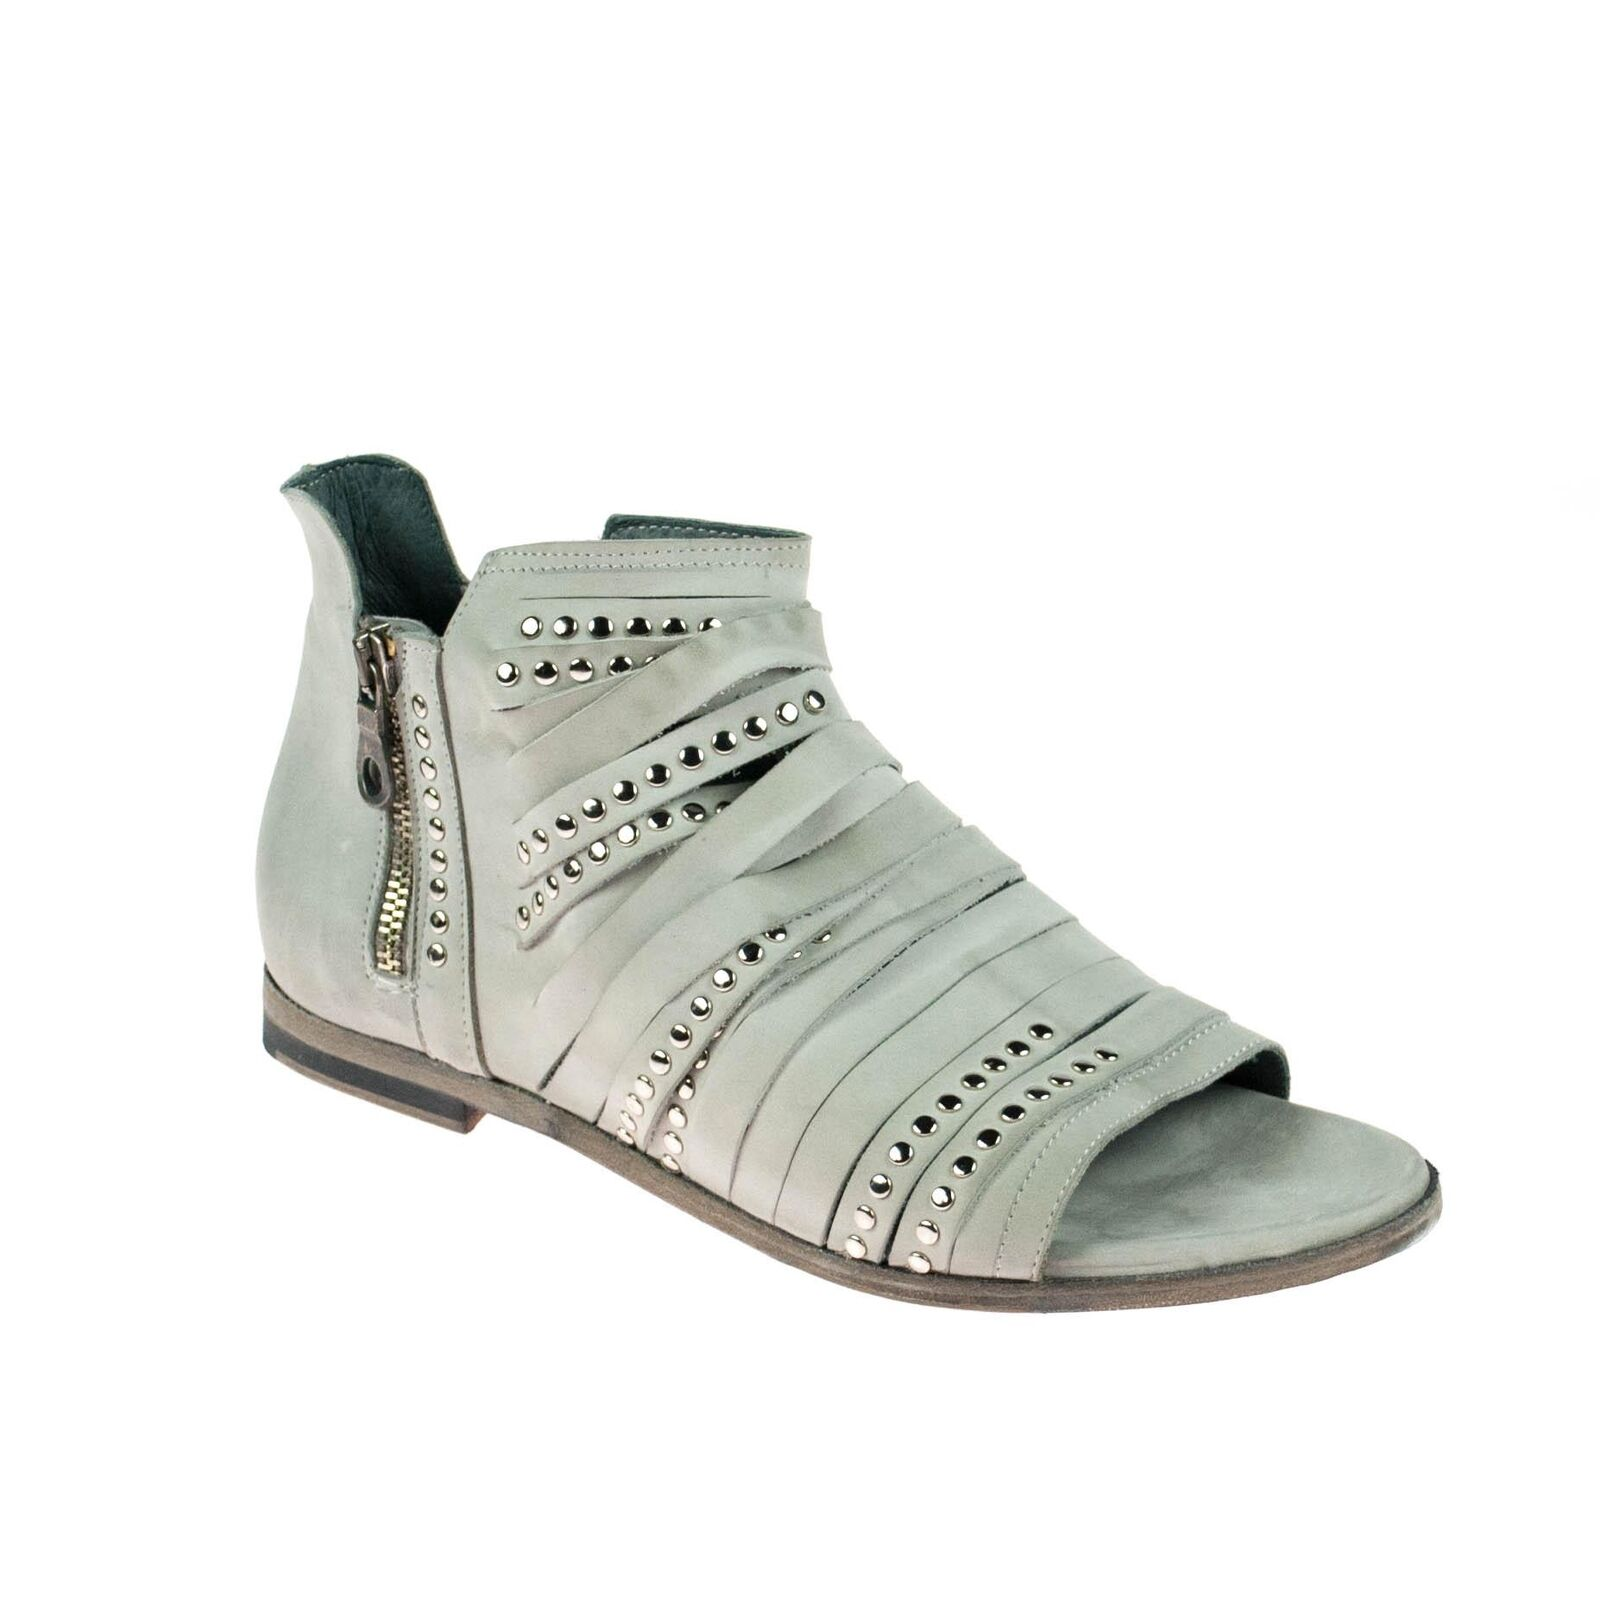 Juice Damen Sandale Leder Beige Grau